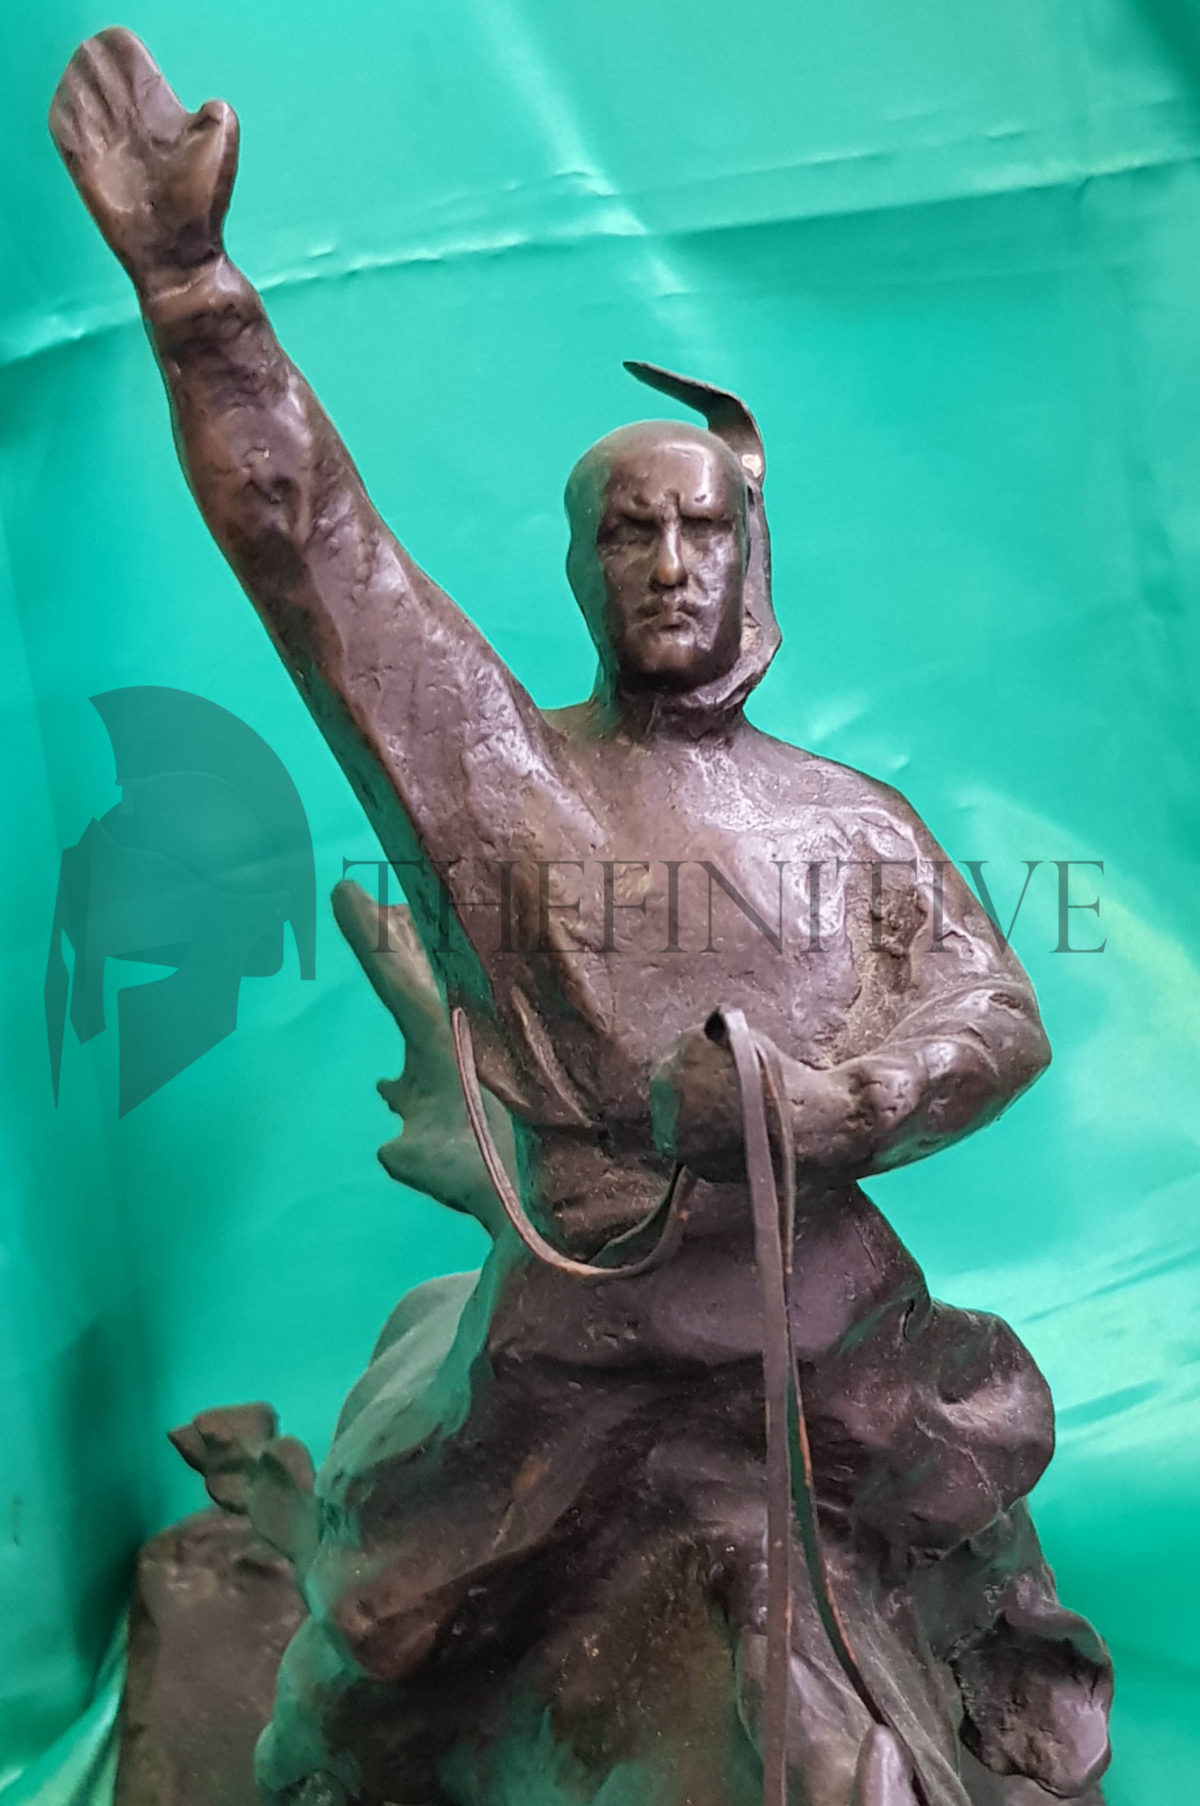 mussolini bronzo statua duce